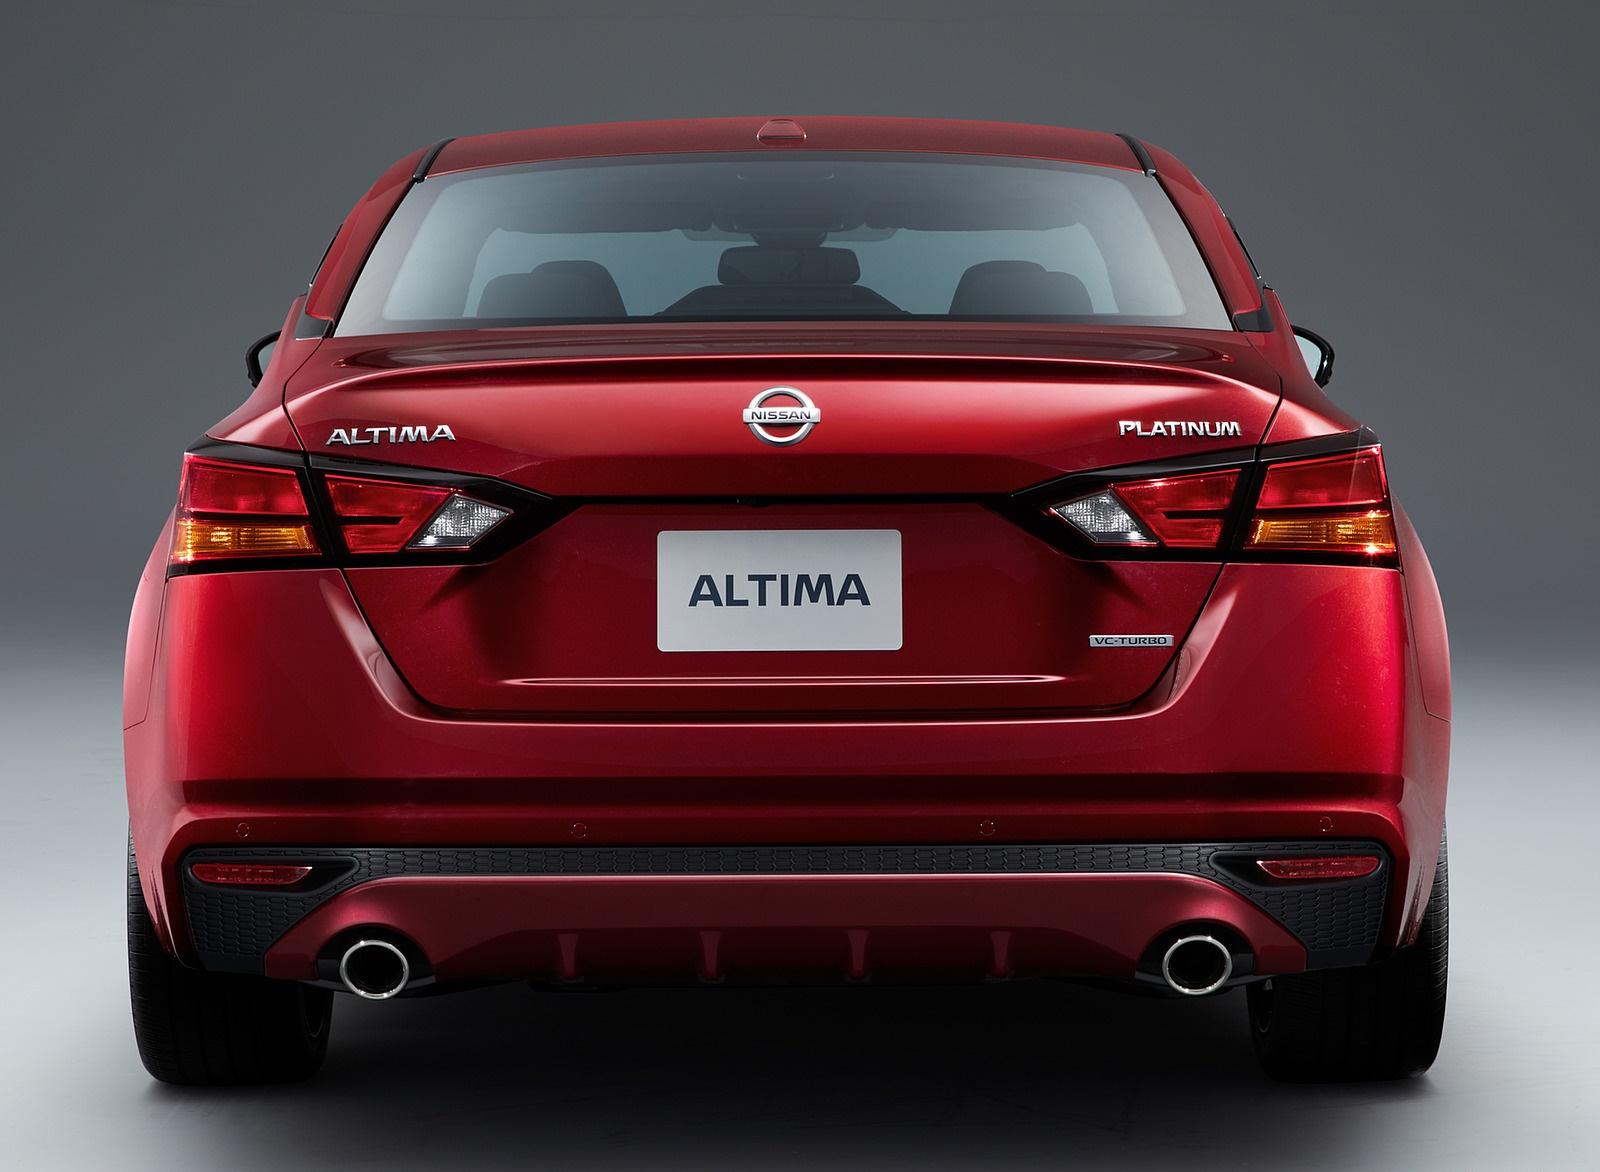 2019 Nissan Altima Rear Wallpaper (10)